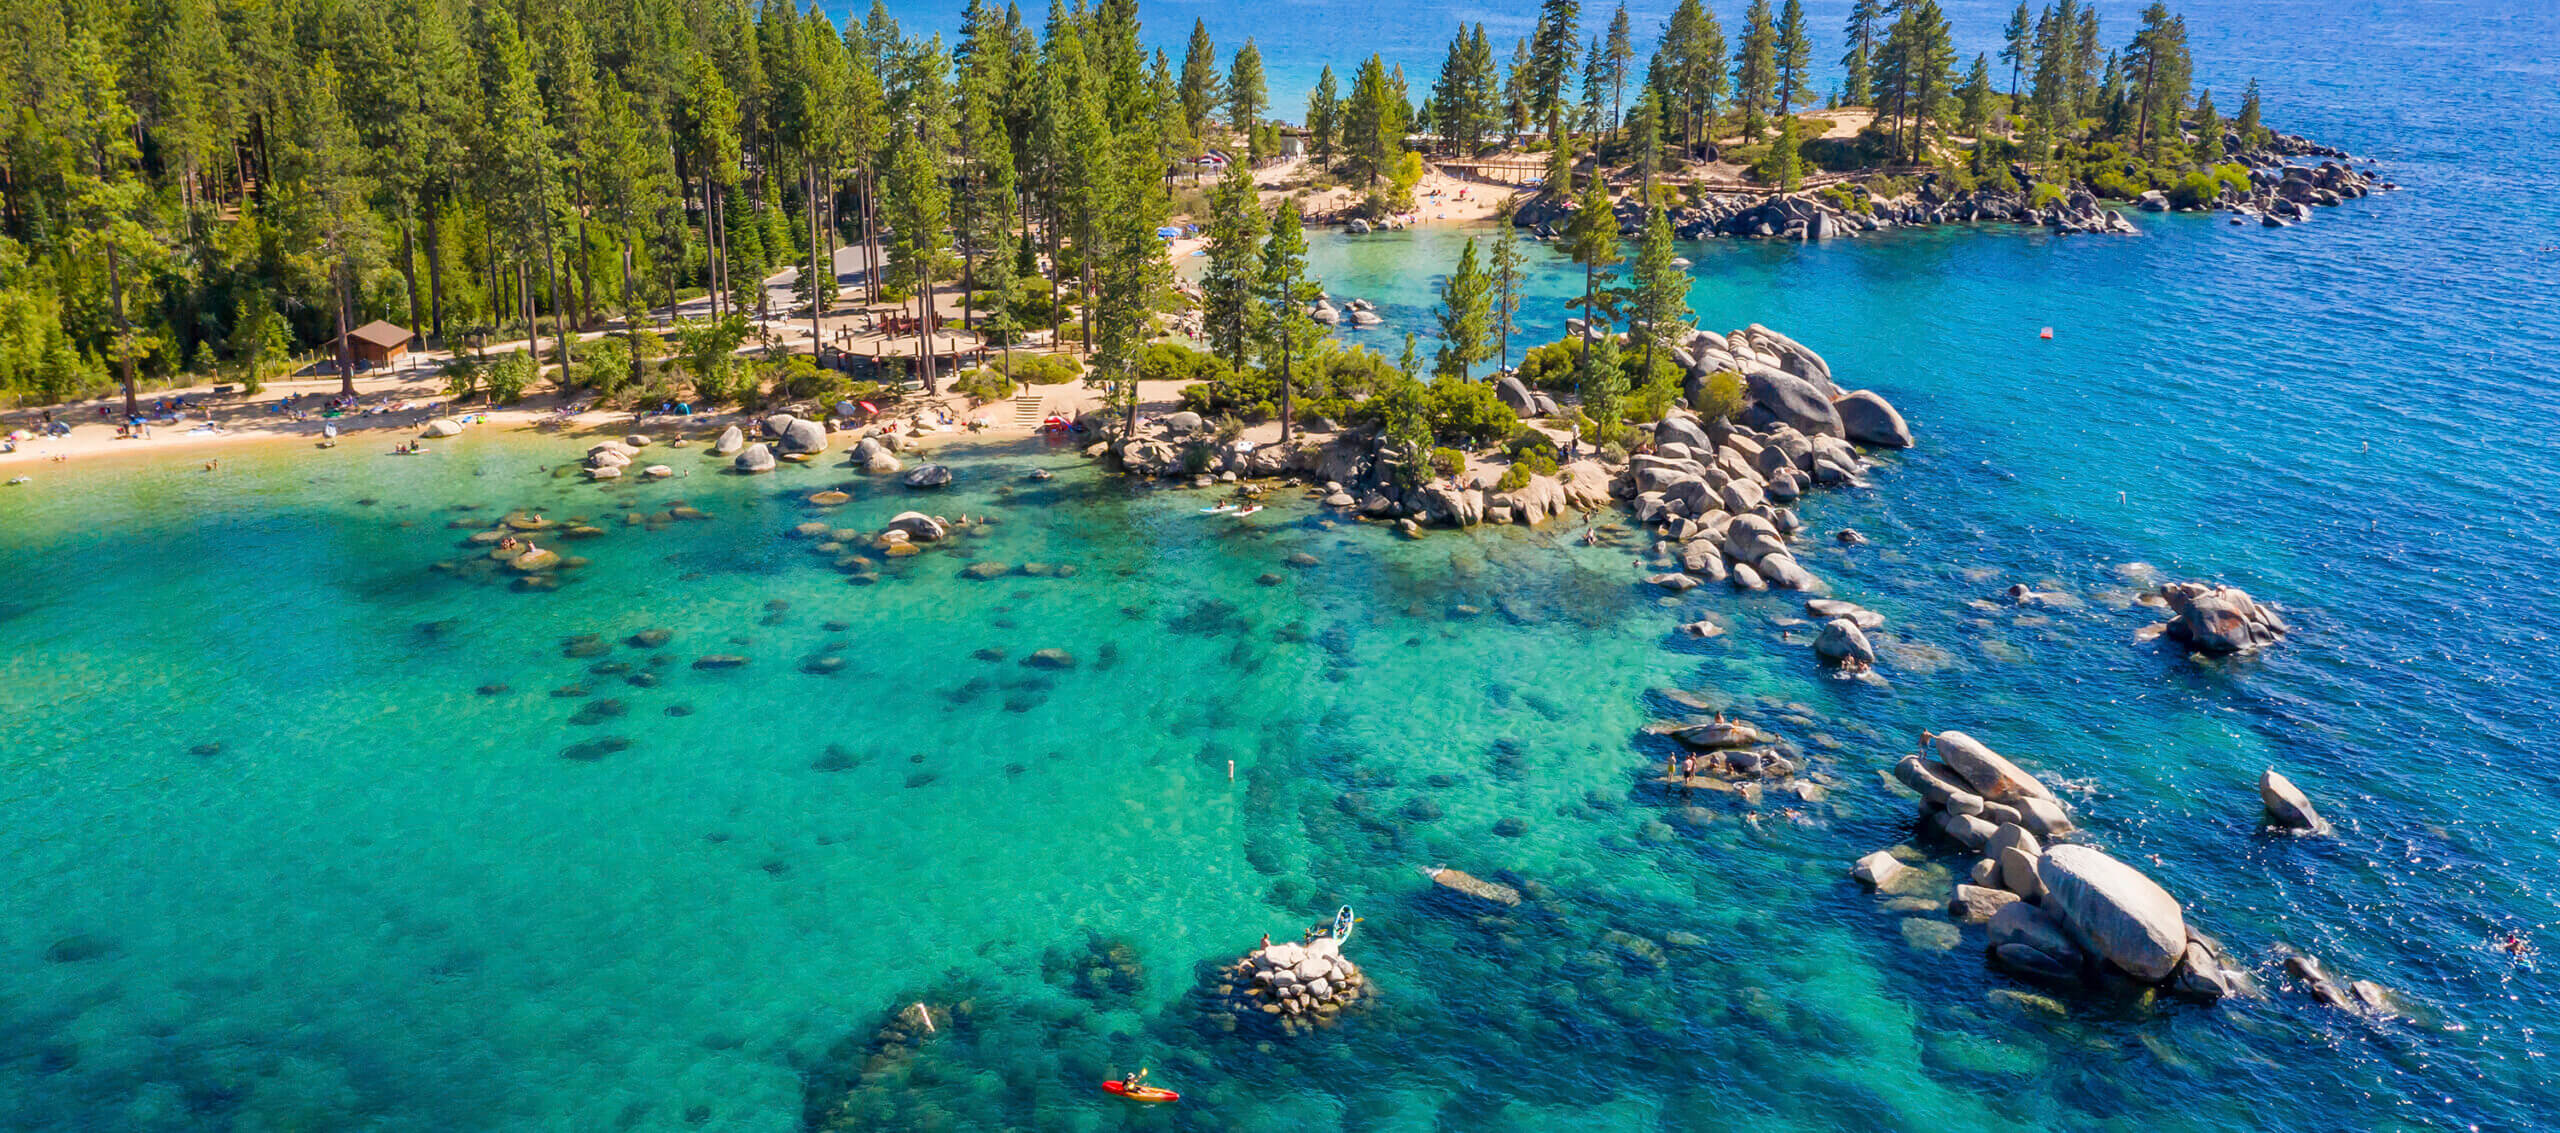 north lake tahoe nv